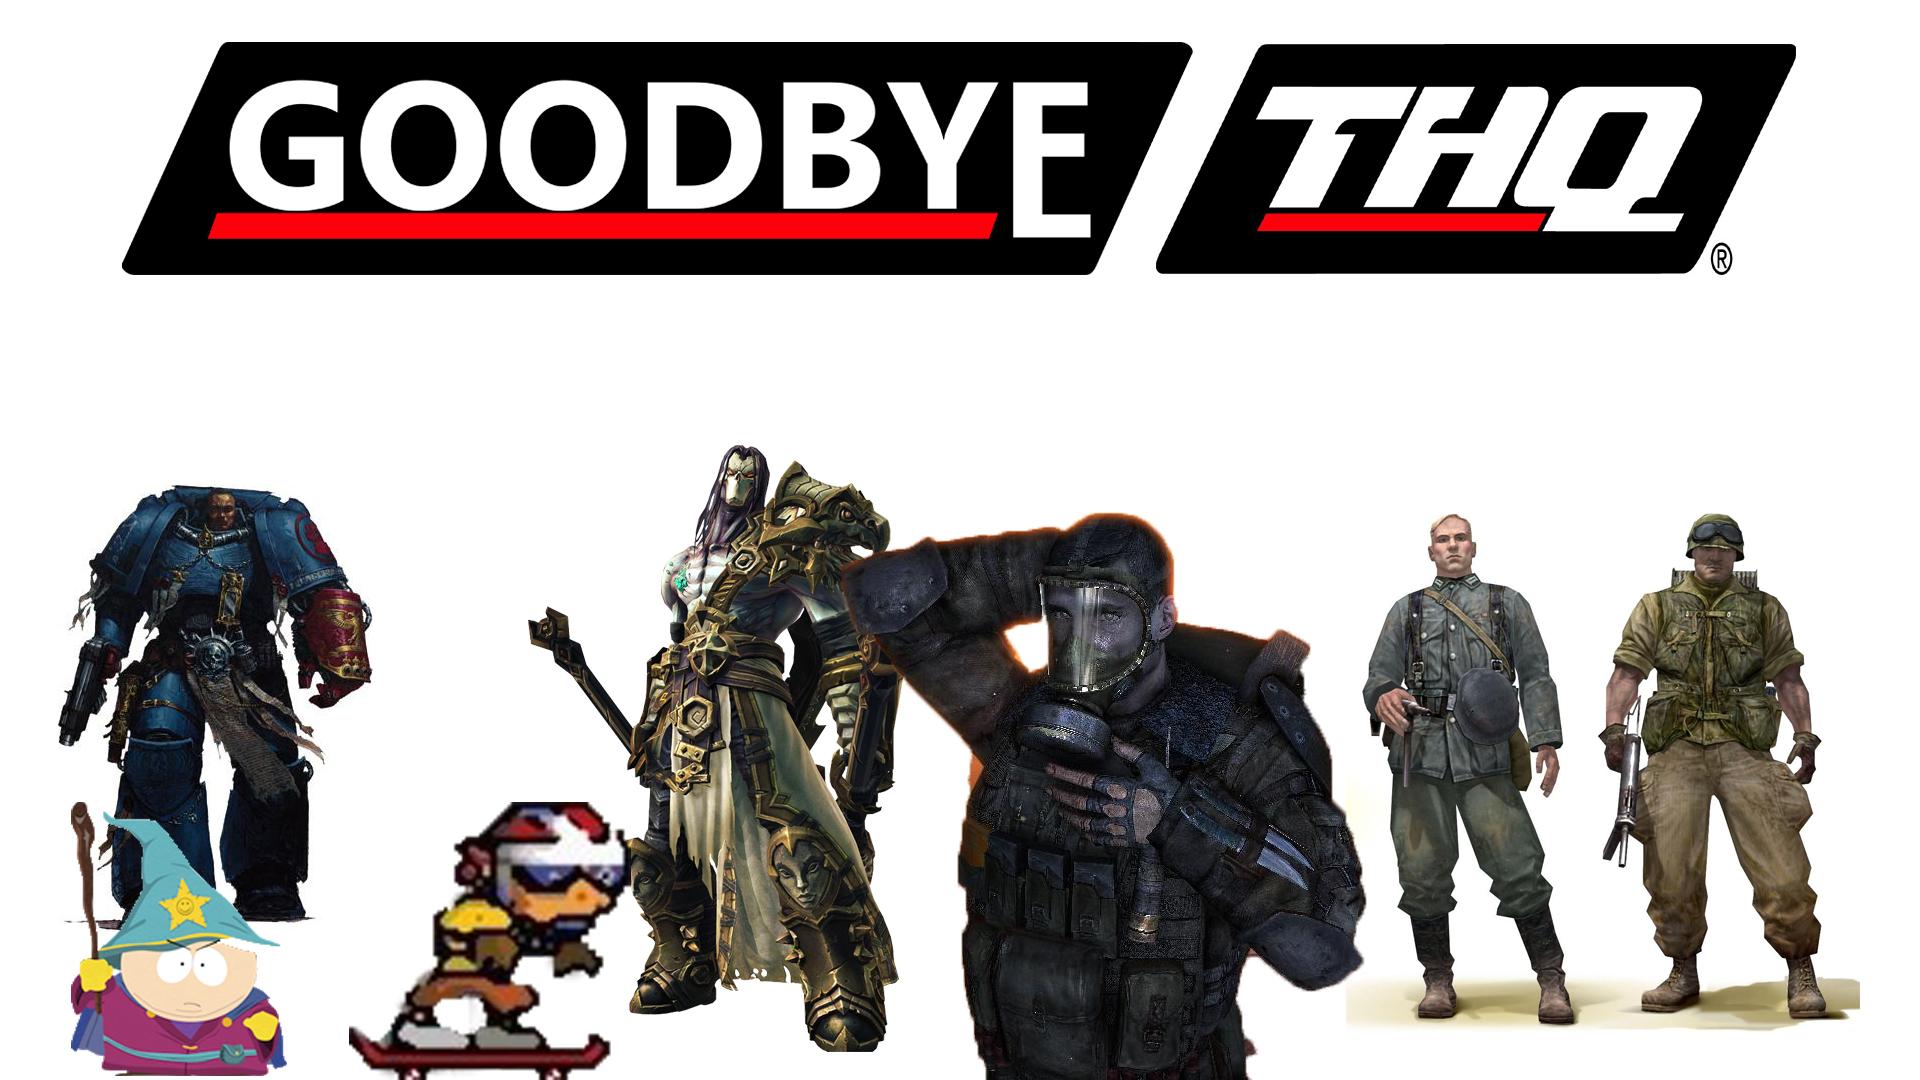 Adios THQ: Recordando viejas glorias [Parte I]